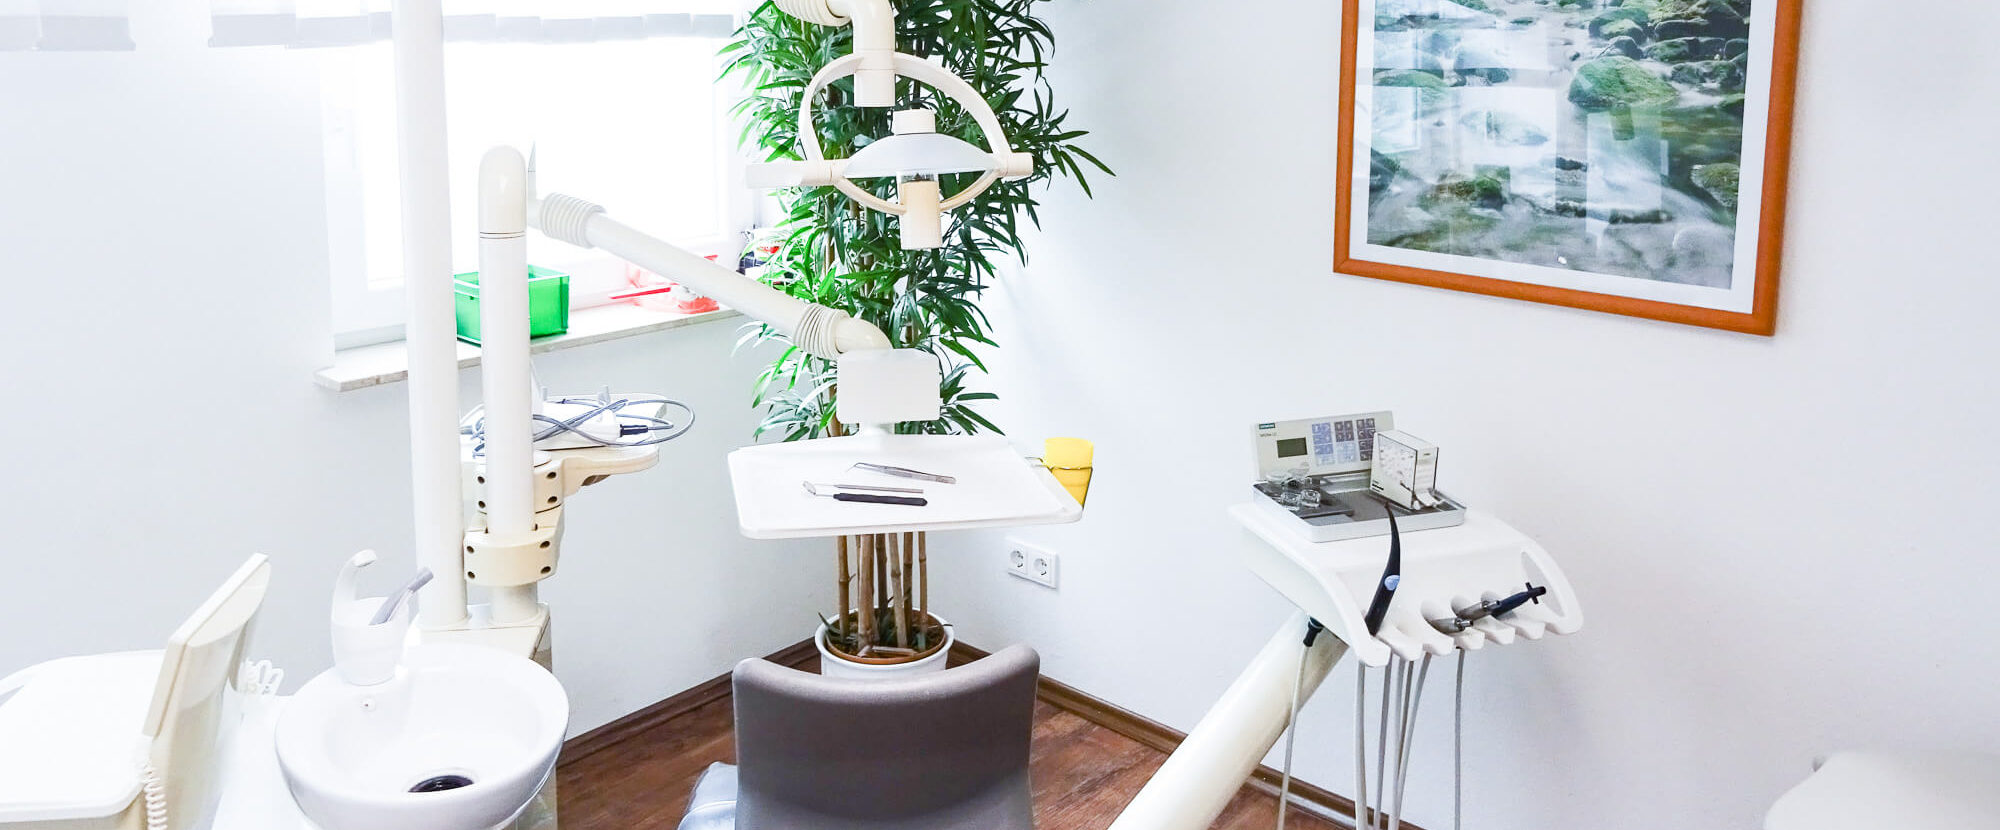 Zahnarztpraxis Kup in Bendorf - Praxisräume